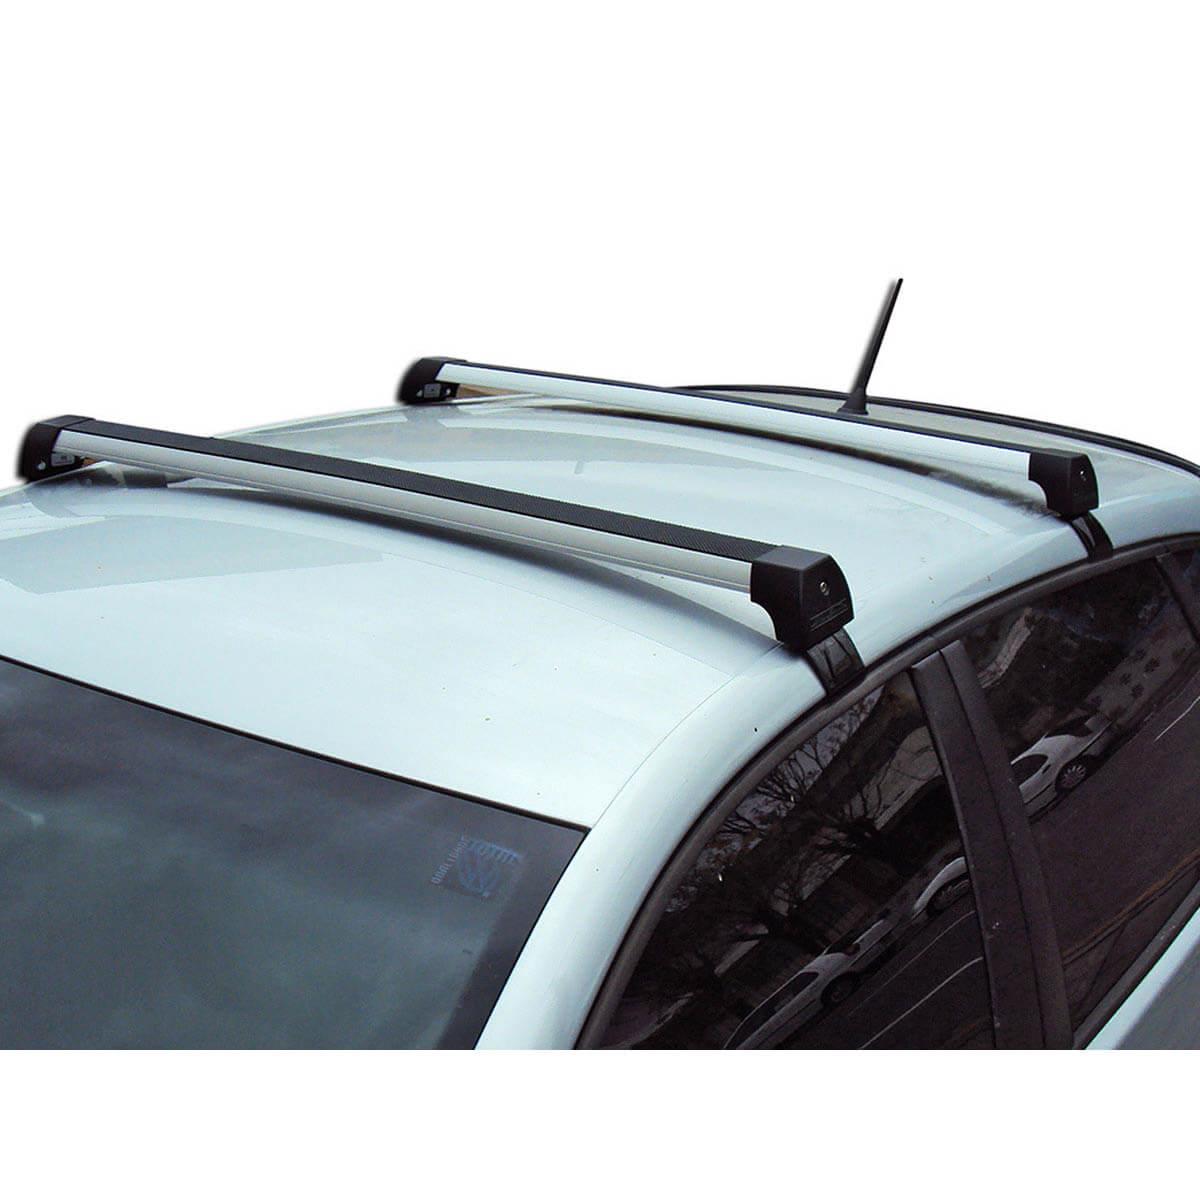 Rack de teto Long Life Sports Peugeot 3008 2011 a 2015 sem teto solar